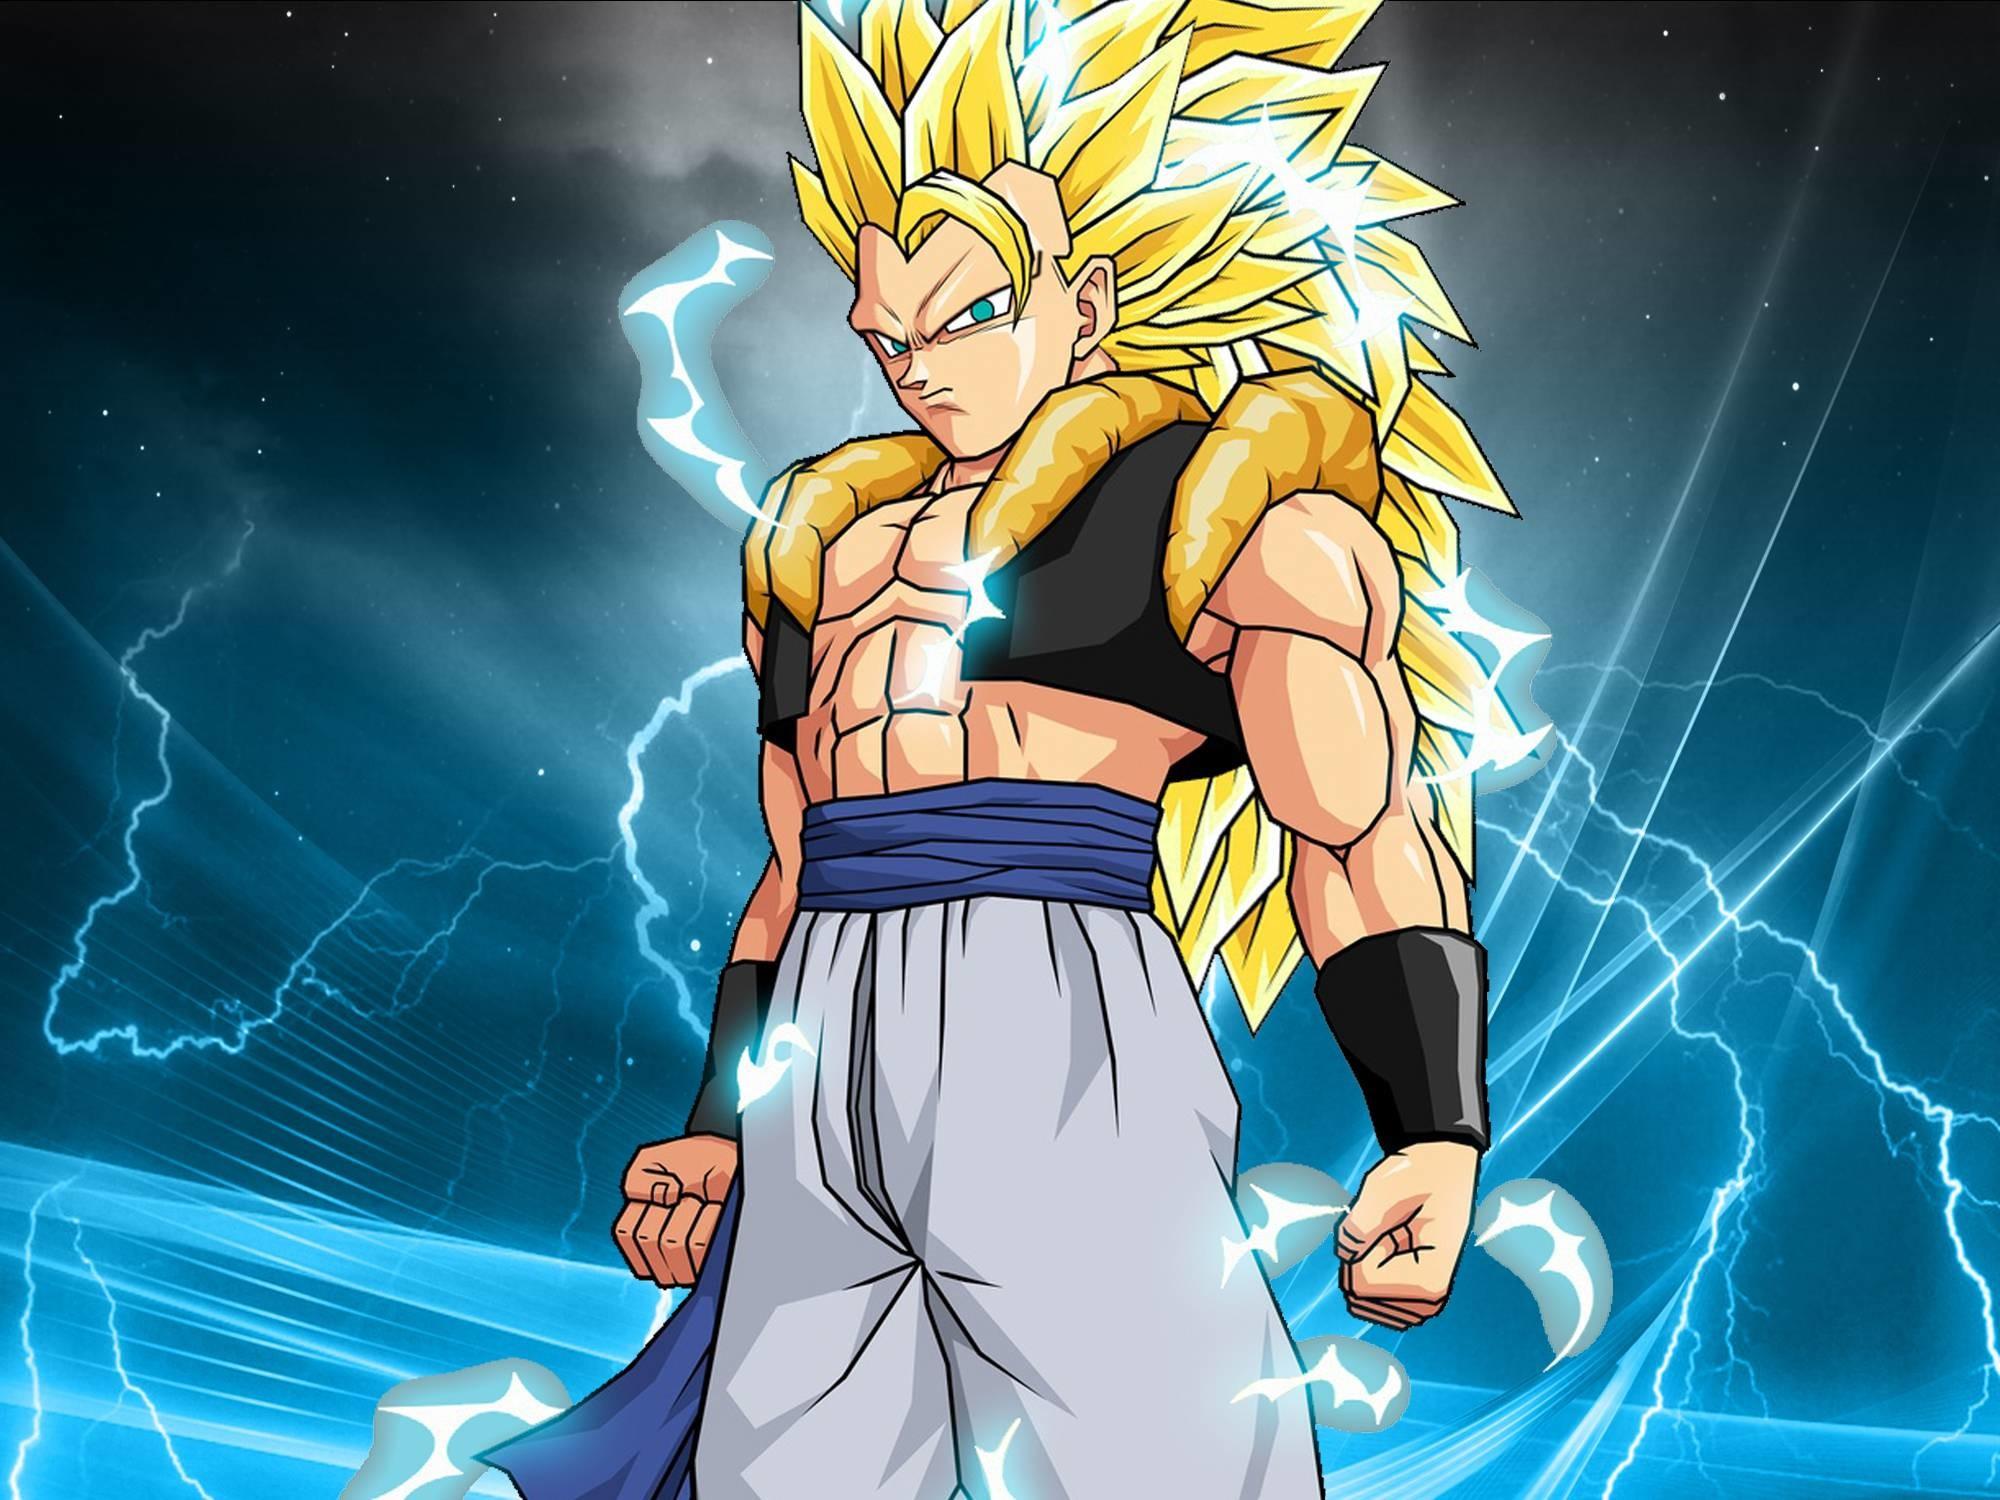 DBZ Goku wall 1 by VikumG712 on DeviantArt